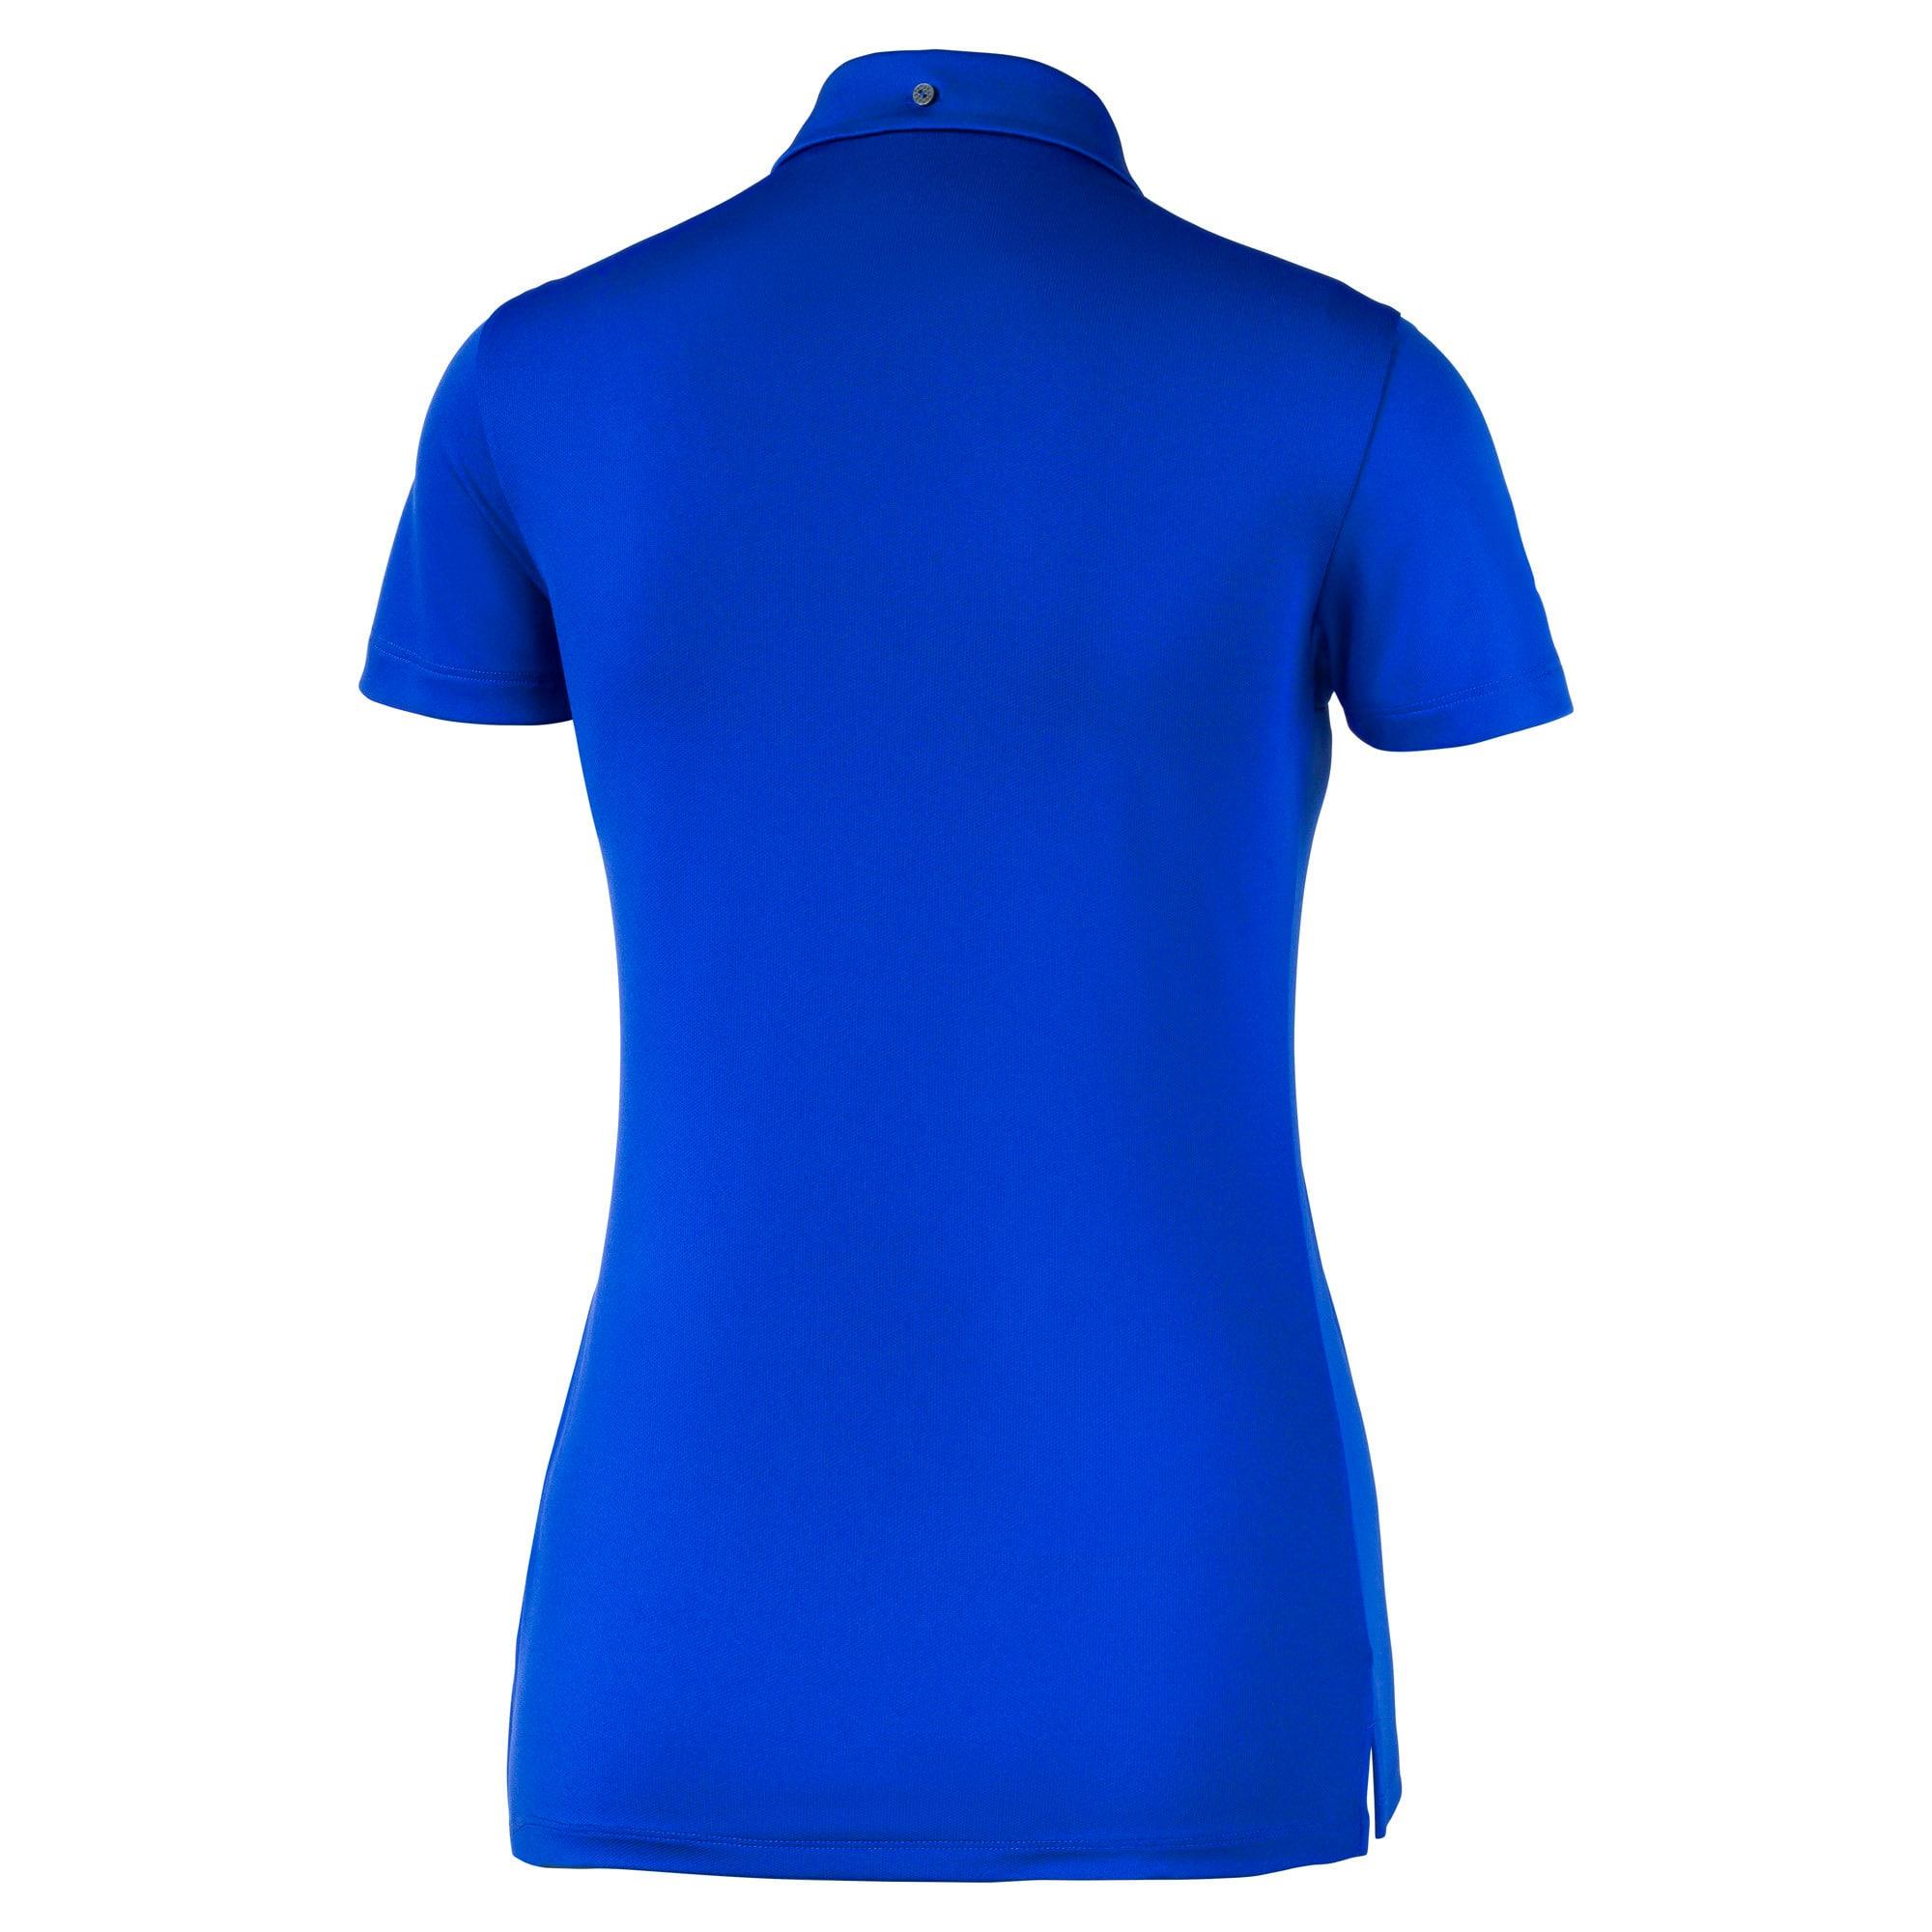 Thumbnail 5 of Golfpoloshirts voor dames, Dazzling Blue, medium